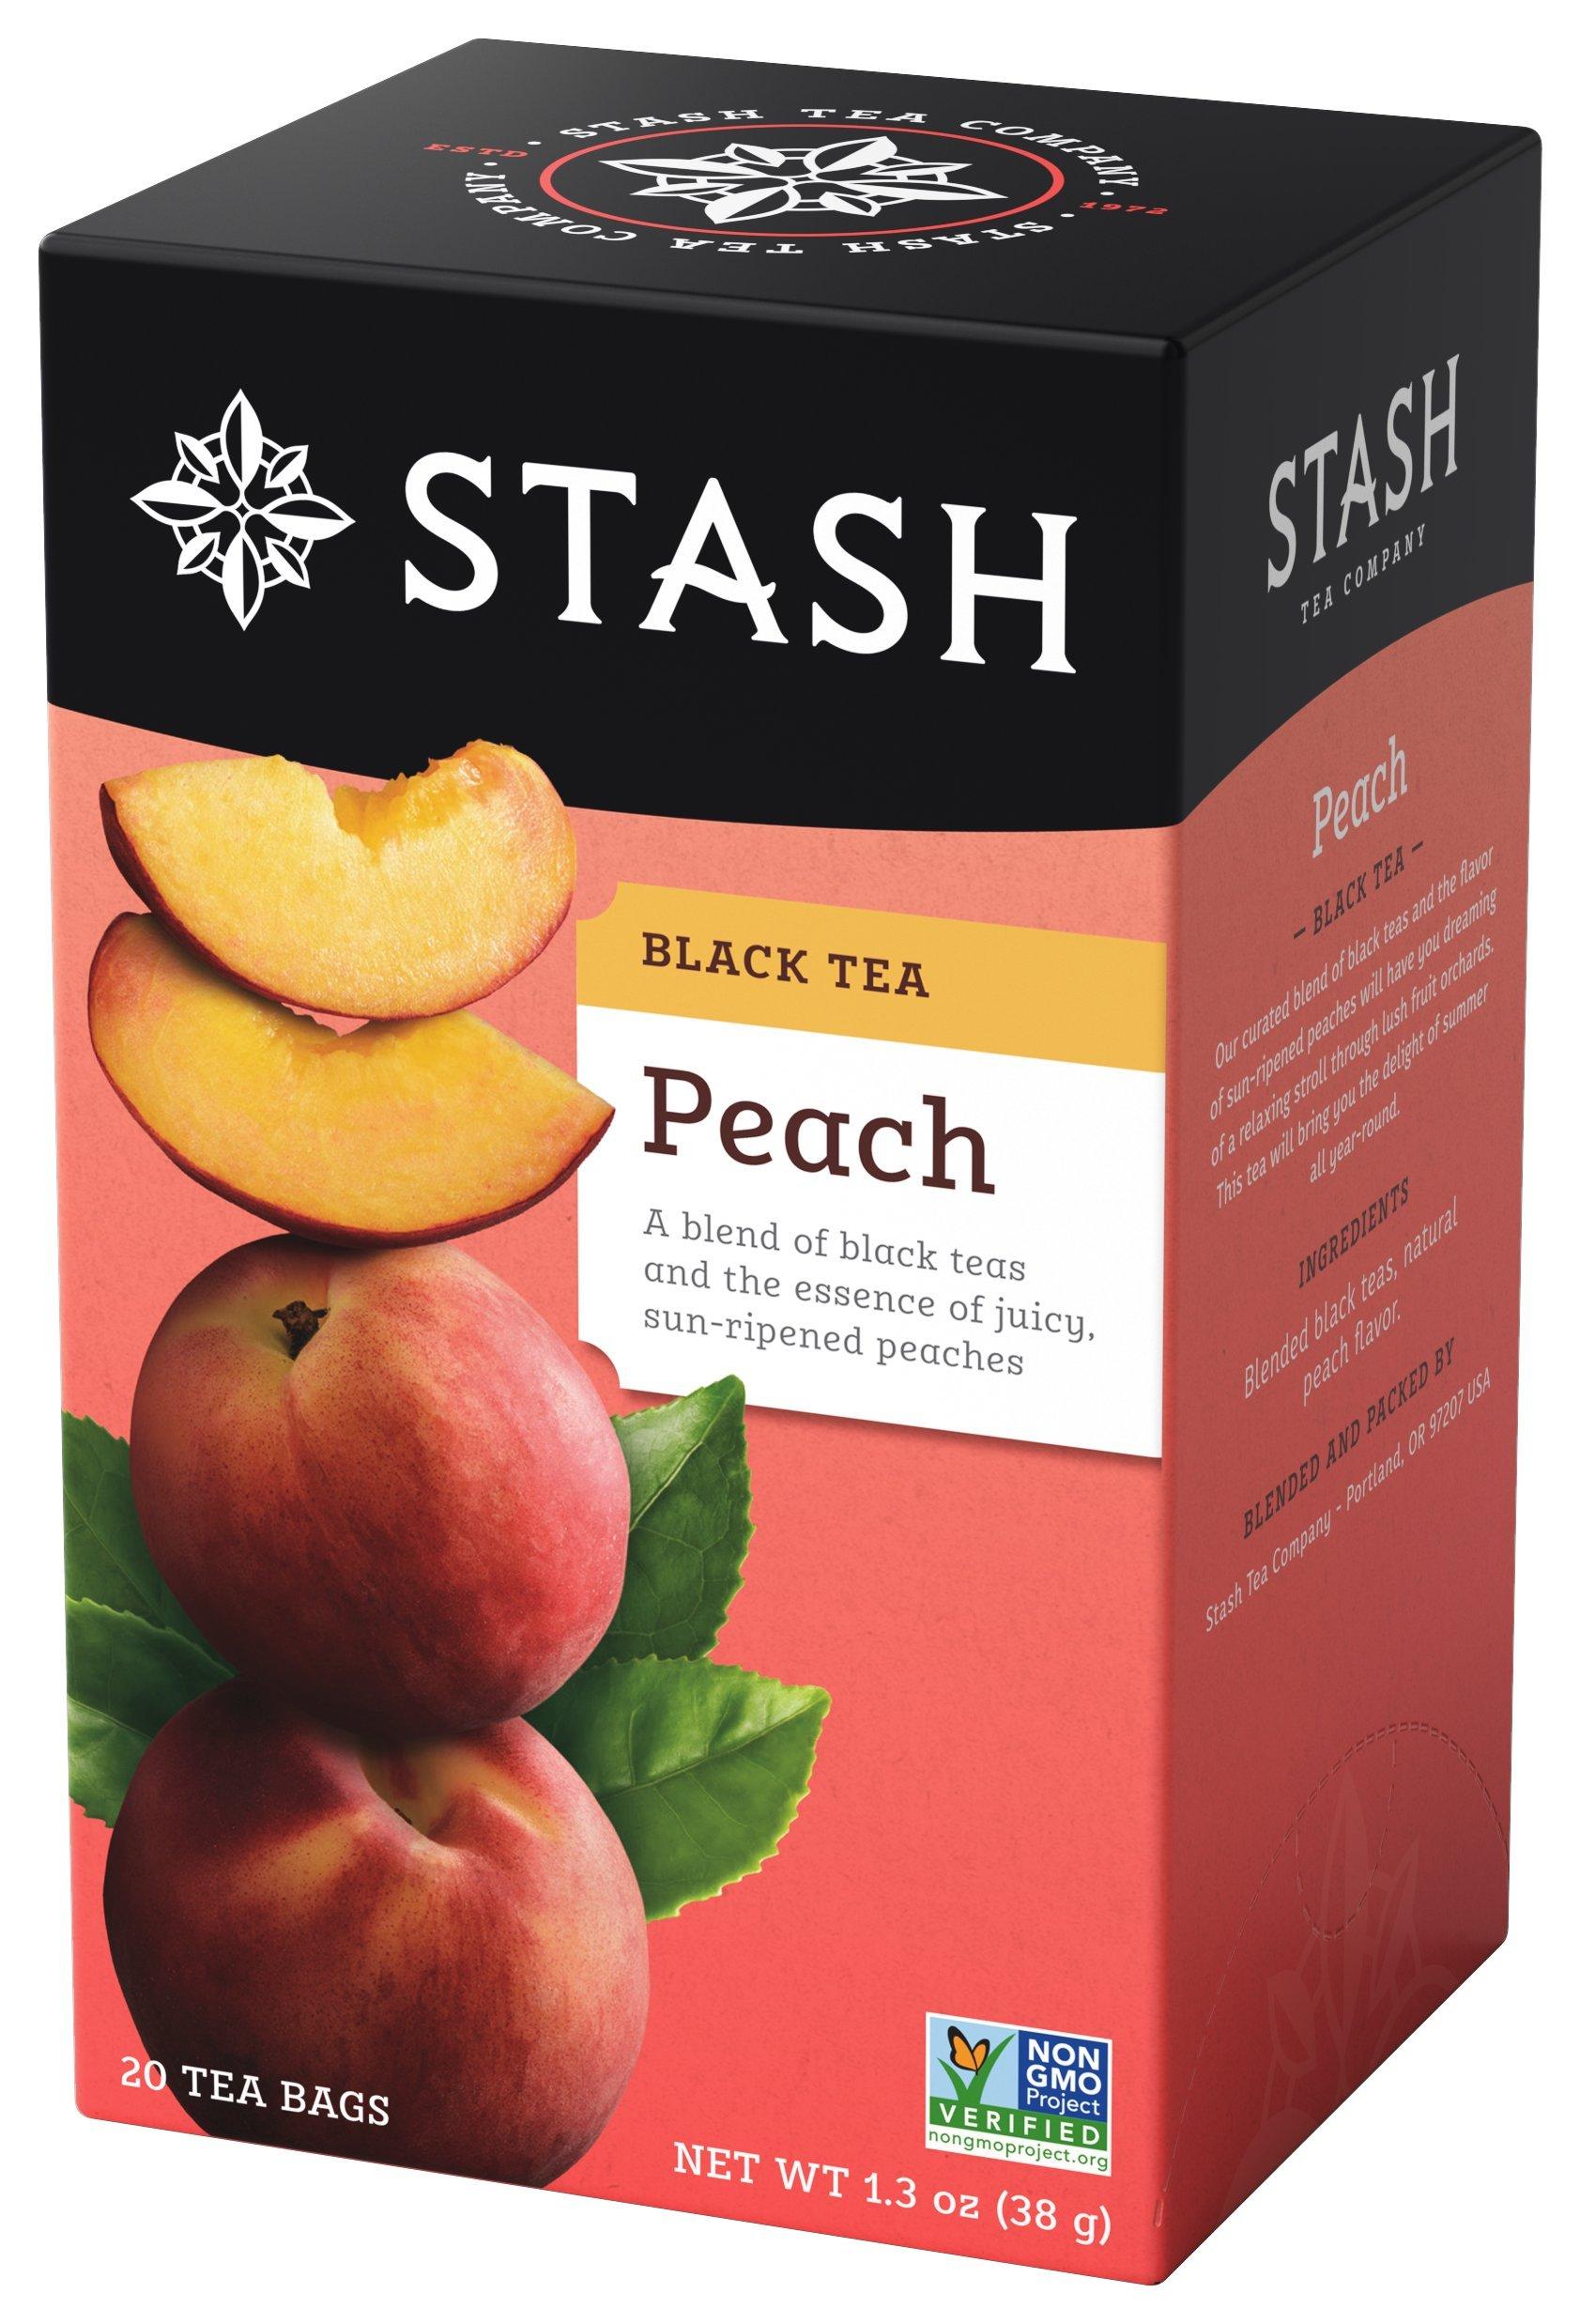 Stash Tea Peach Black Tea 20 Count Tea Bags in Foil (Pack of 6) Individual Black Tea Bags for Use in Teapots Mugs or Cups, Brew Hot Tea or Iced Tea